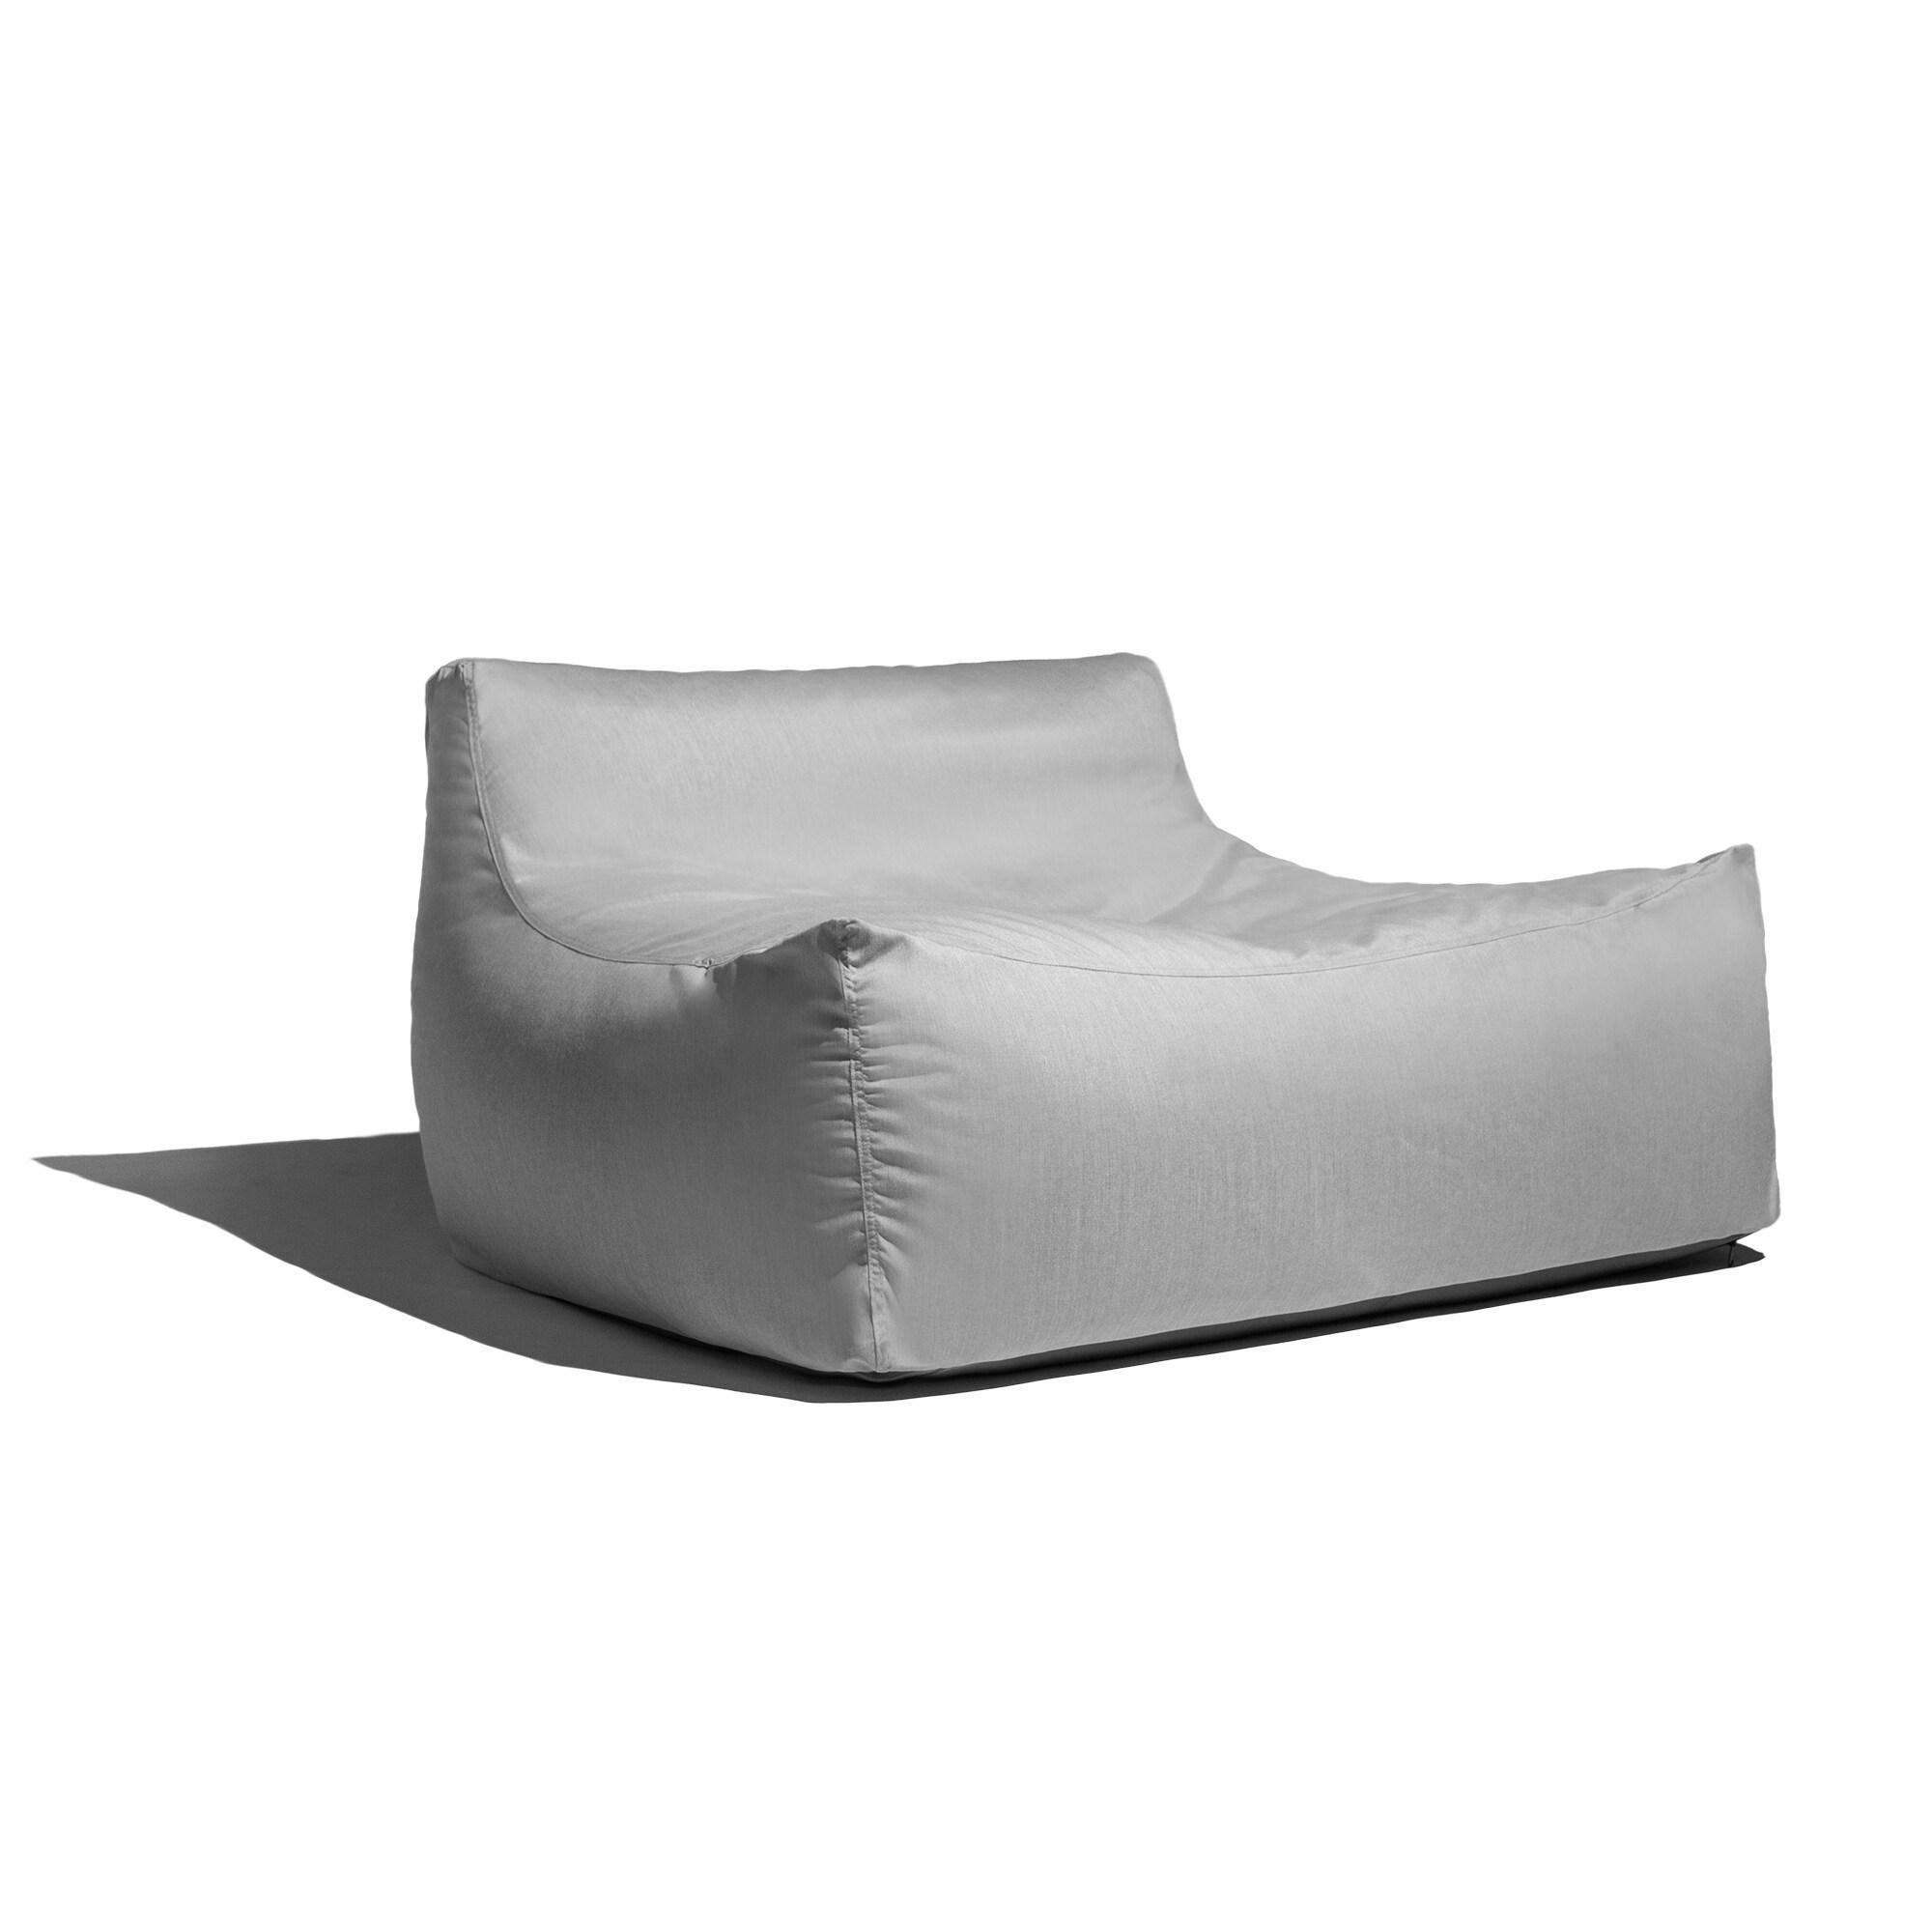 Ja Lavista Outdoor Bean Bag Loveseat Modern Patio Sofa Free Shipping Today 21425722